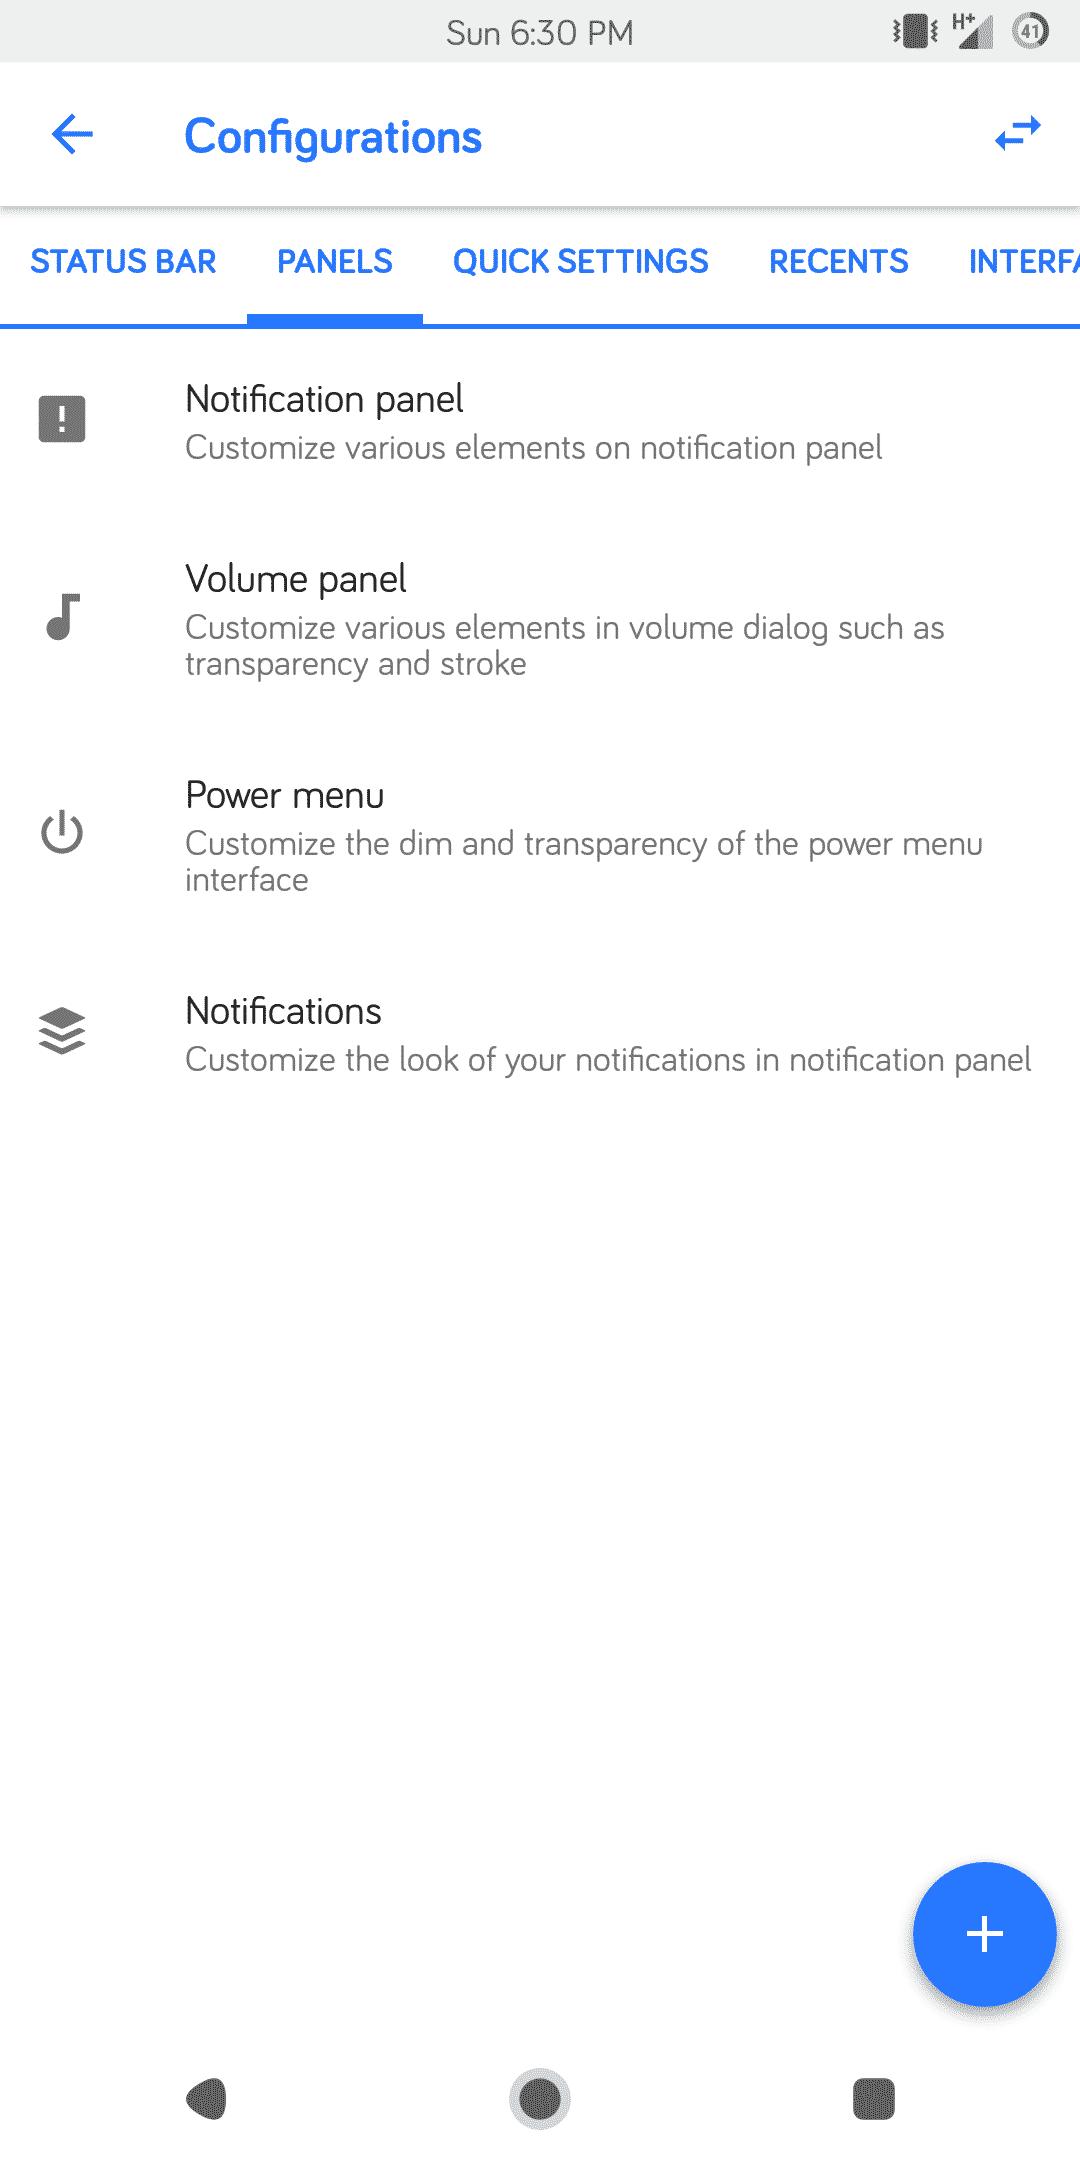 Install Treble Enabled Custom ROMs on Redmi Note 4 (Mido) | Techorfy